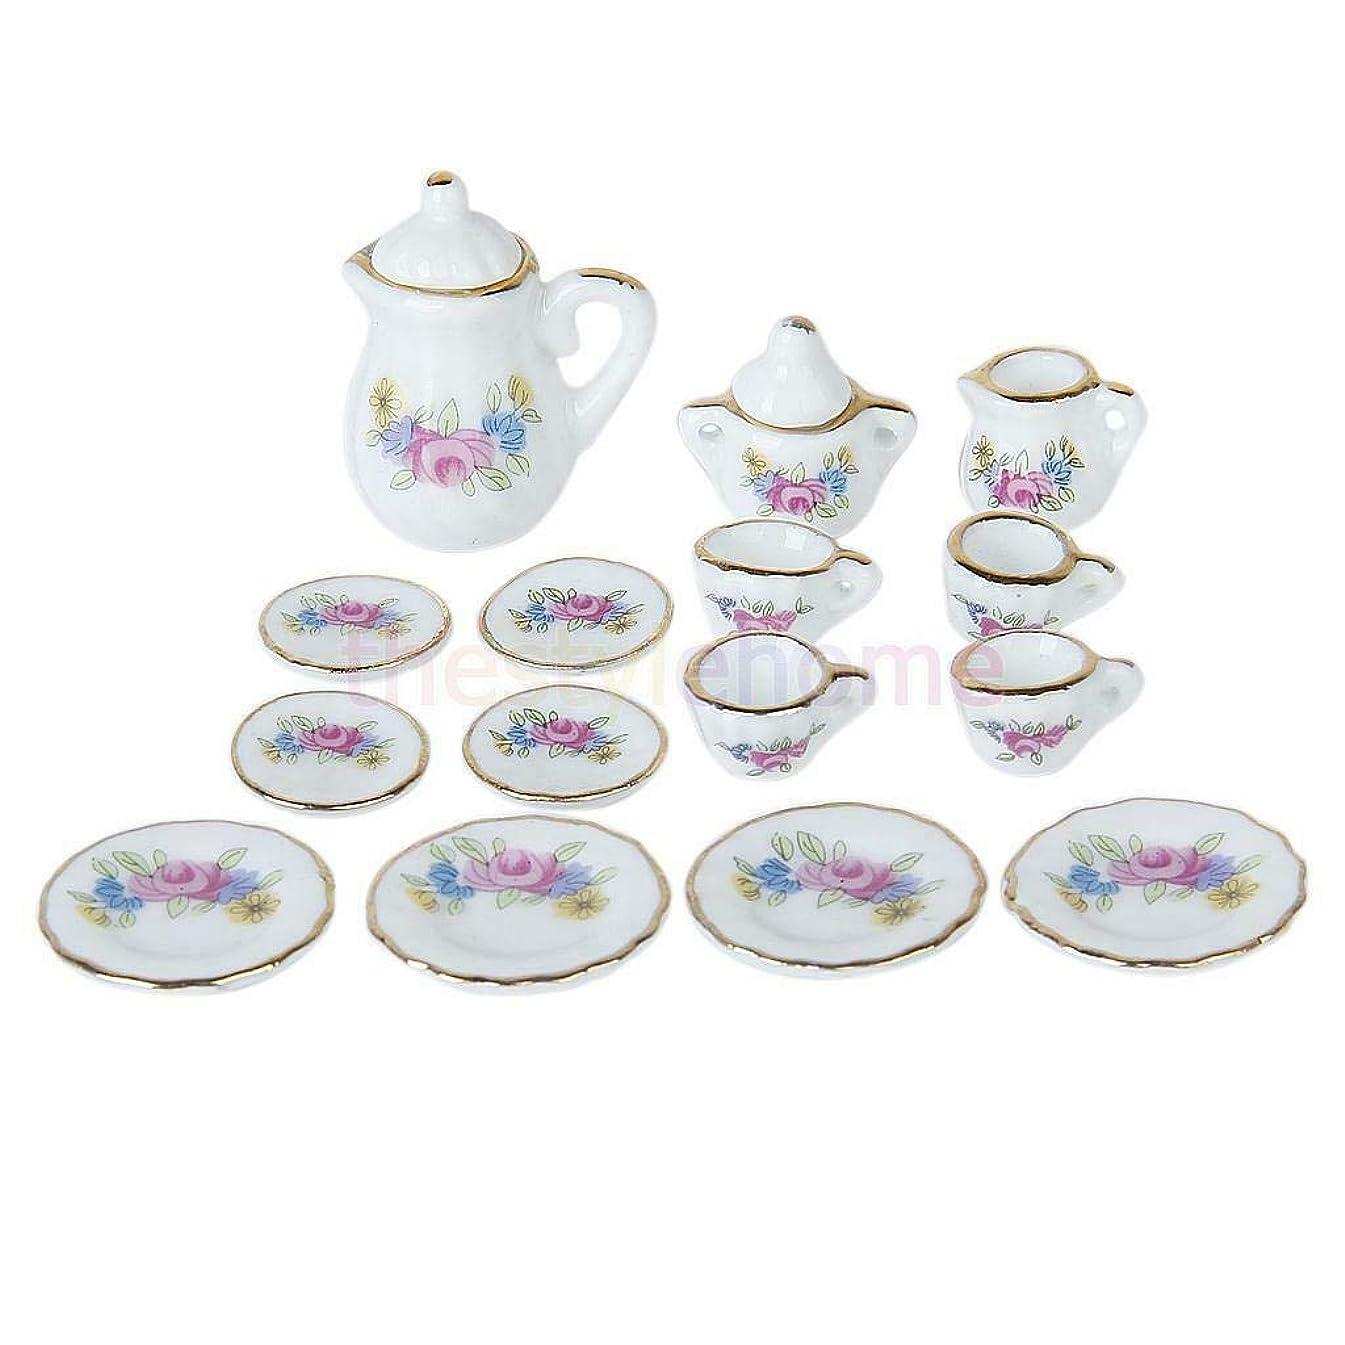 NATFUR 15PCS Dollhouse Miniature Dining Ware Porcelain Floral Tea Set Dish Cup Tray etc